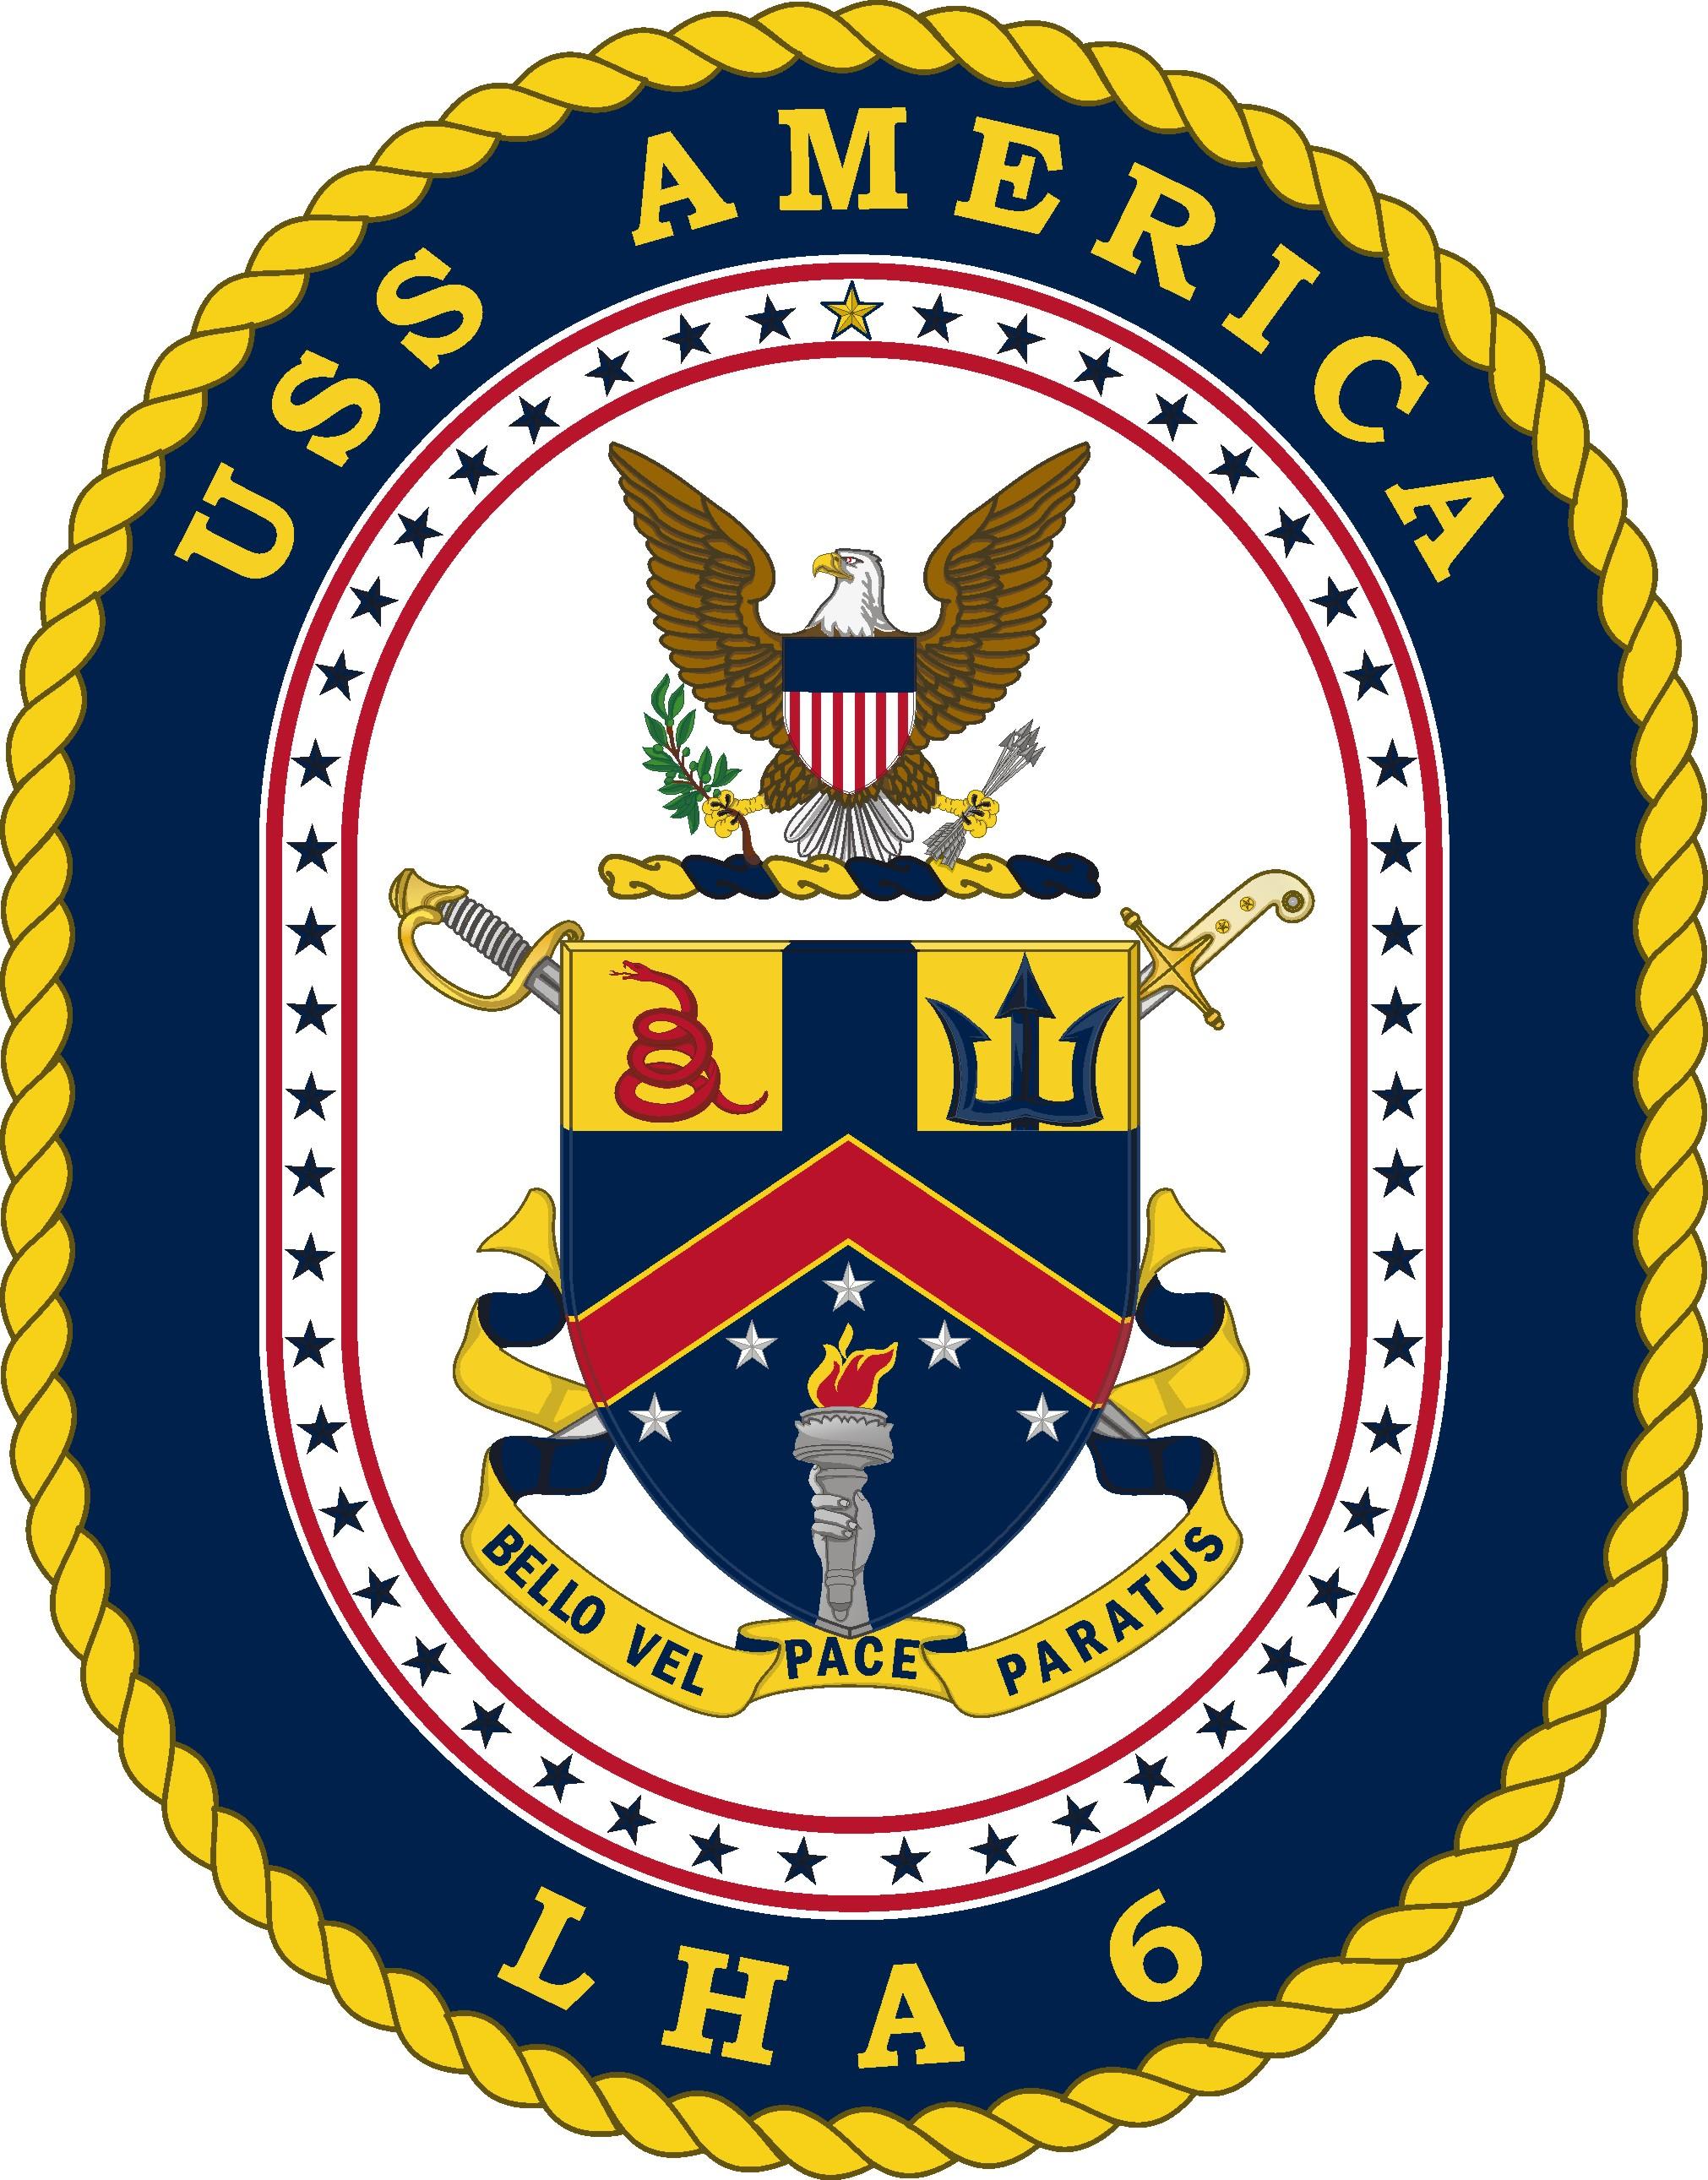 USS AMERICA LHA-6 Crest Grafik: U.S. Navy